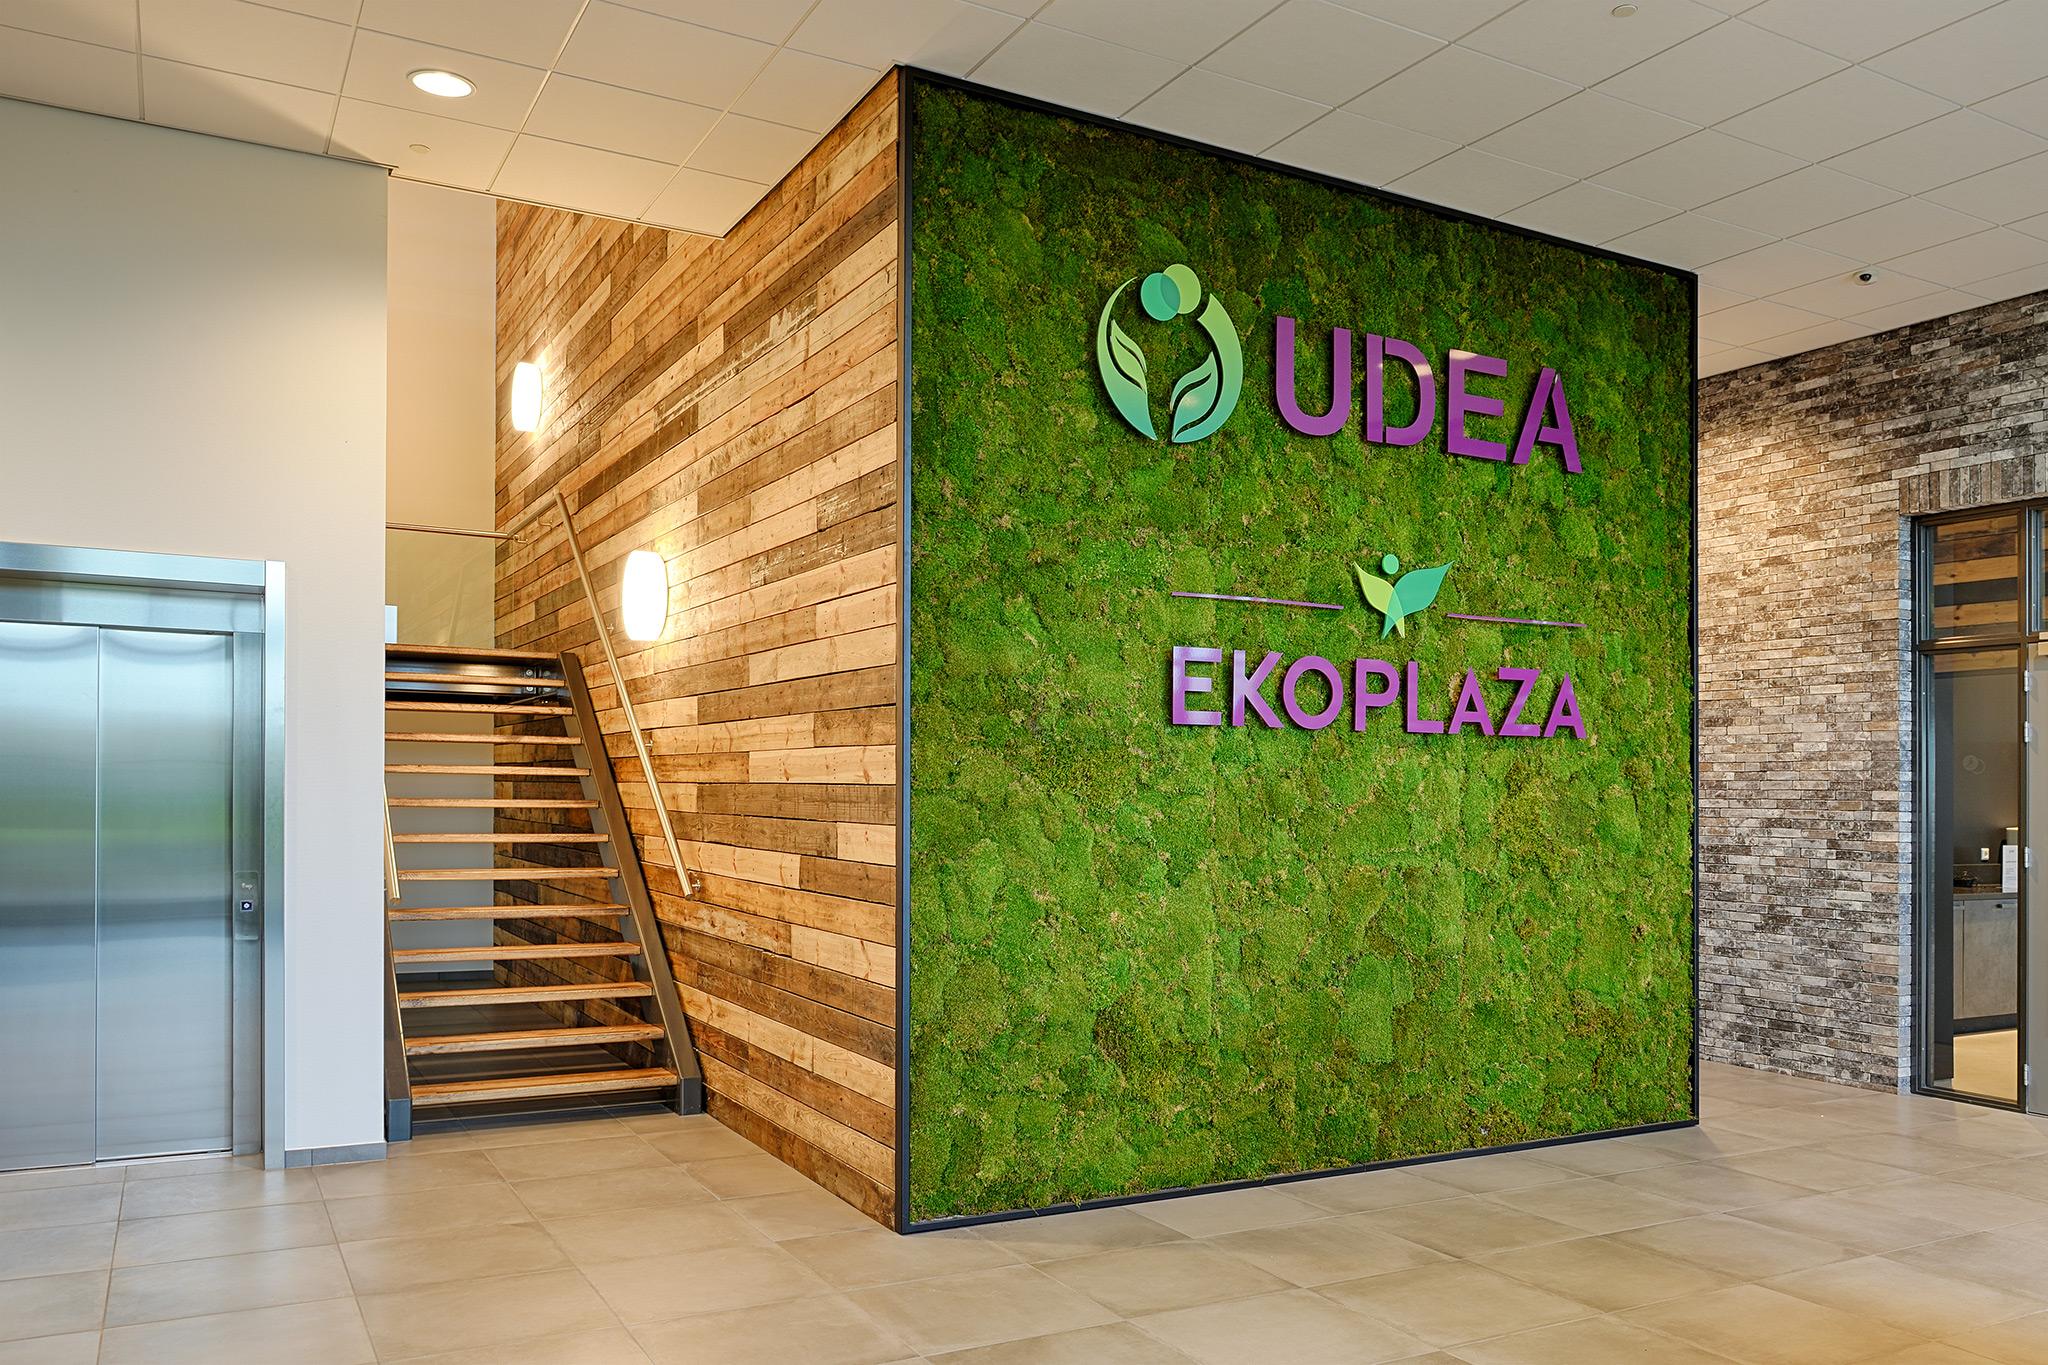 Udea en Ekoplaza nog groener dankzij GRØNN